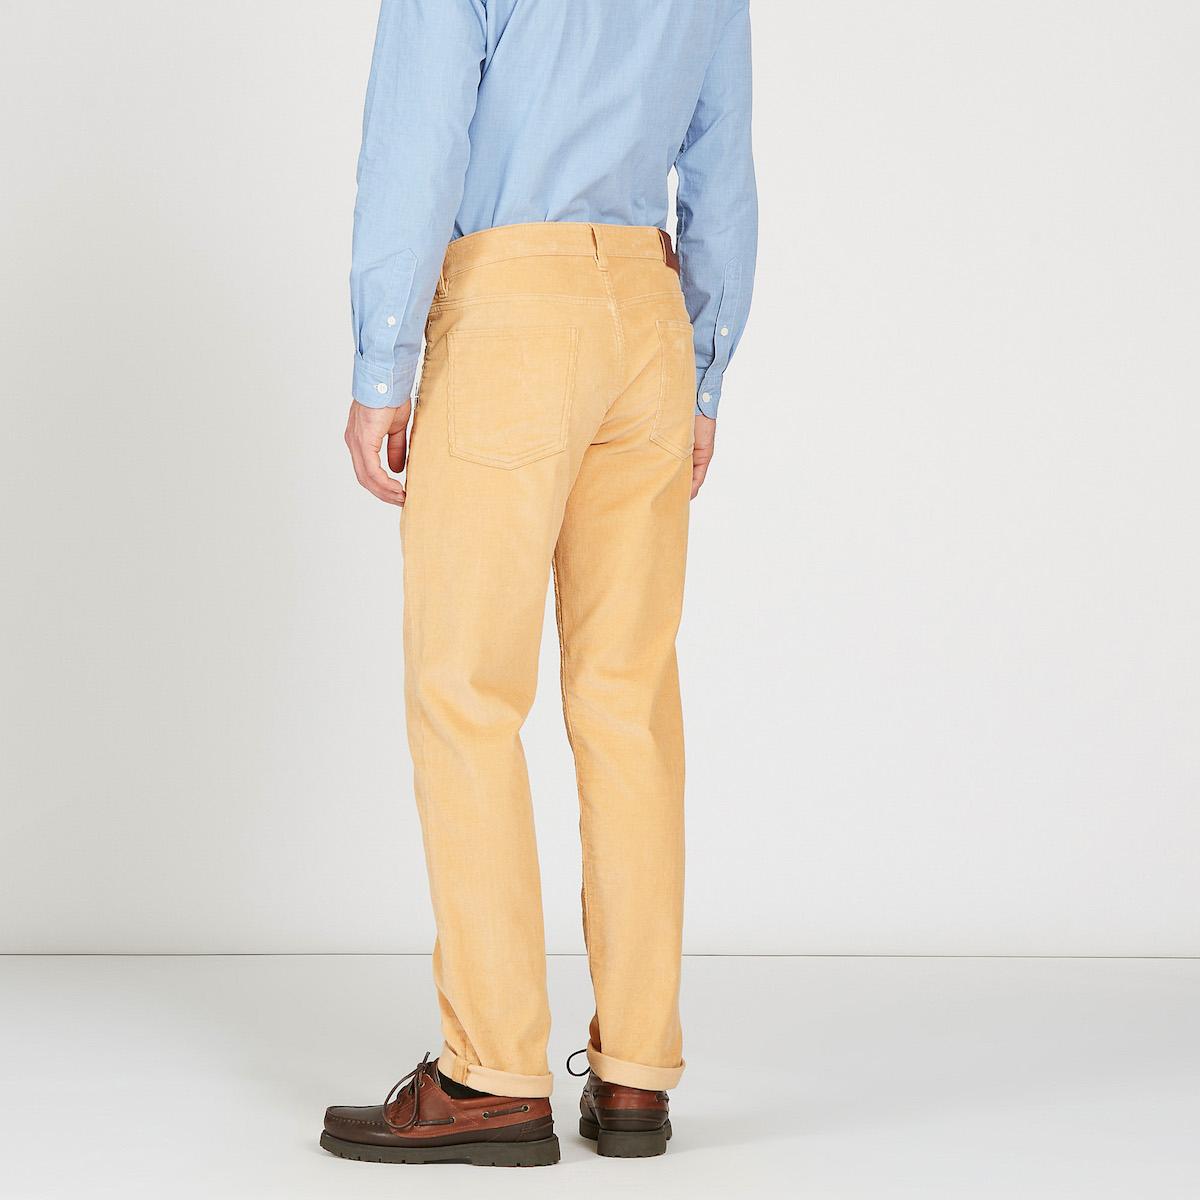 5 Fr Poches Catalog Pantalon Storefront Velours Aigle He29bIWEDY